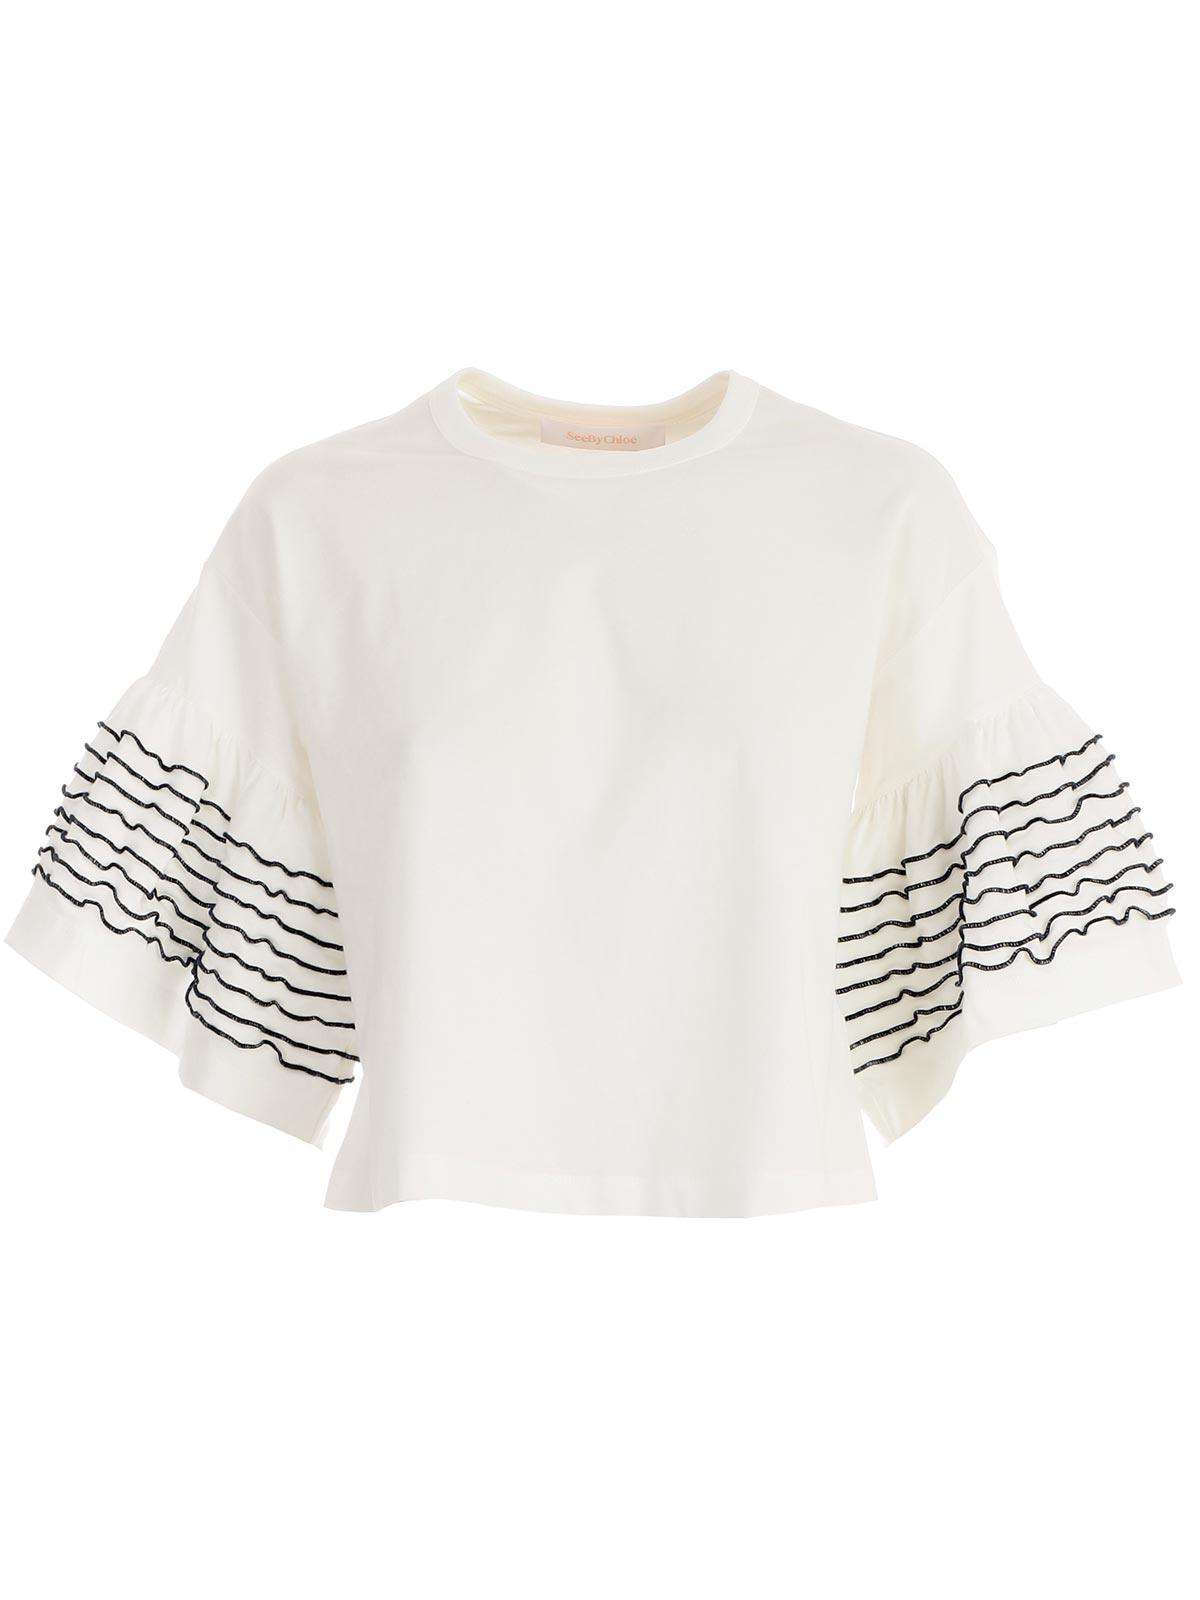 Picture of Seebychloe T-Shirt